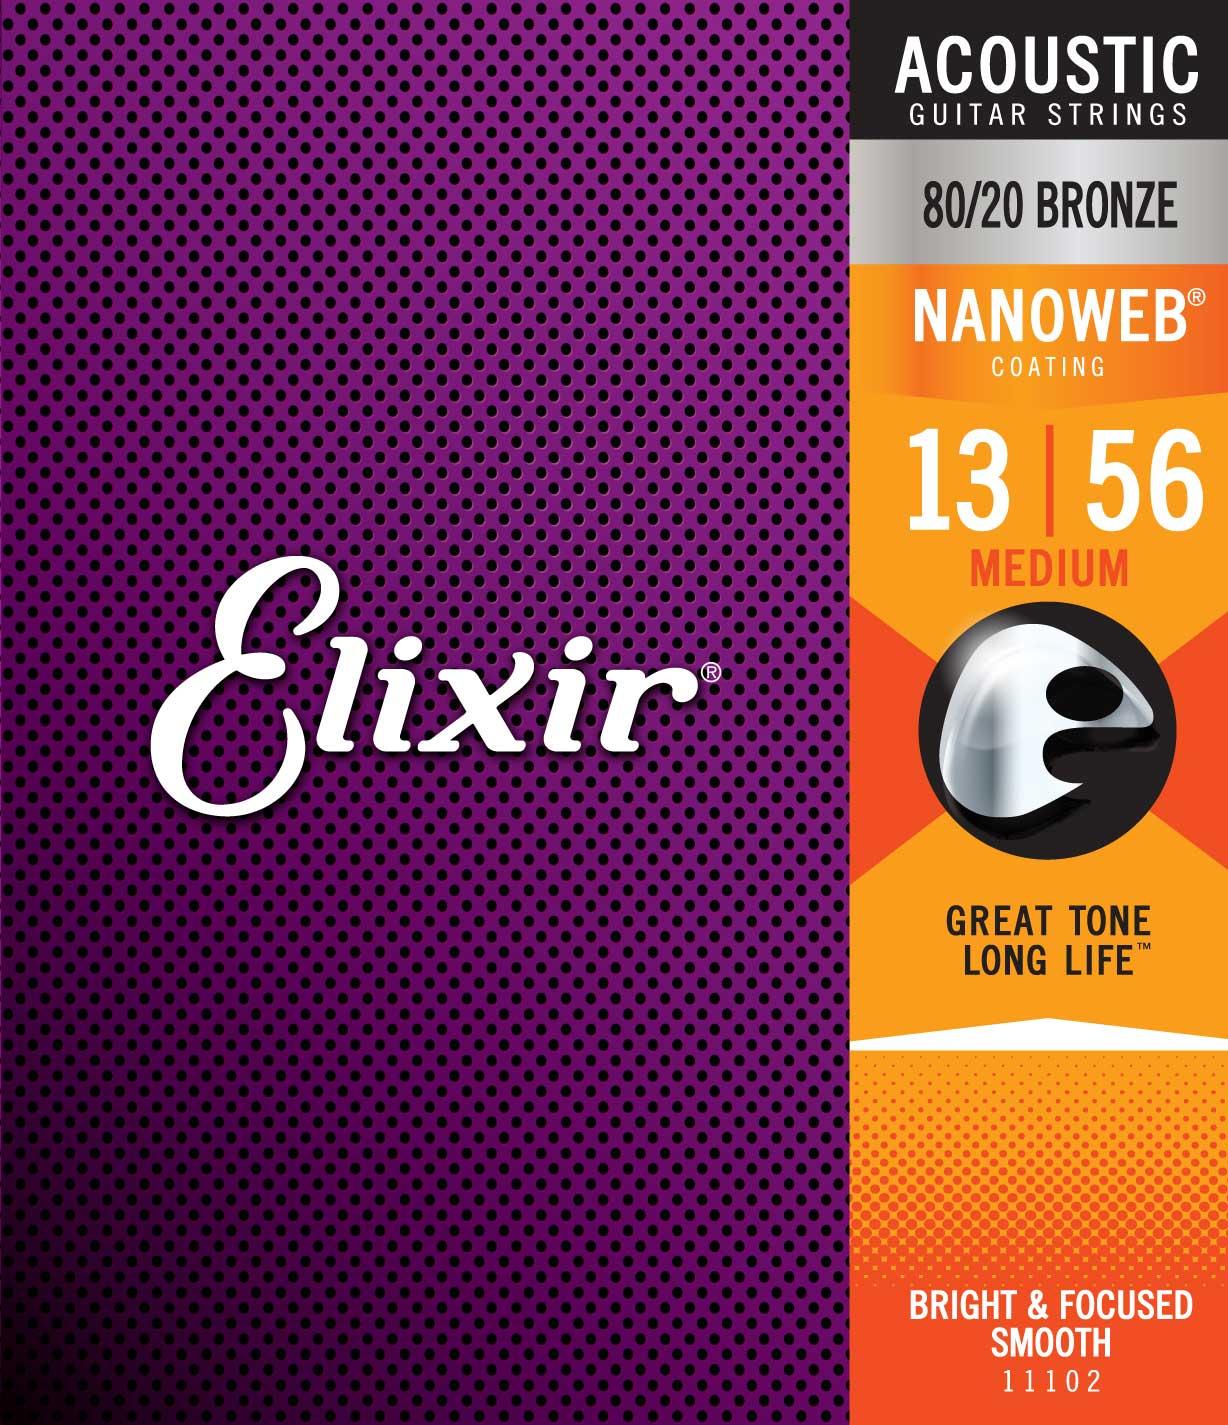 ELIXIR 11102 ACOUSTIC 80/20 BRONZE NANOWEB